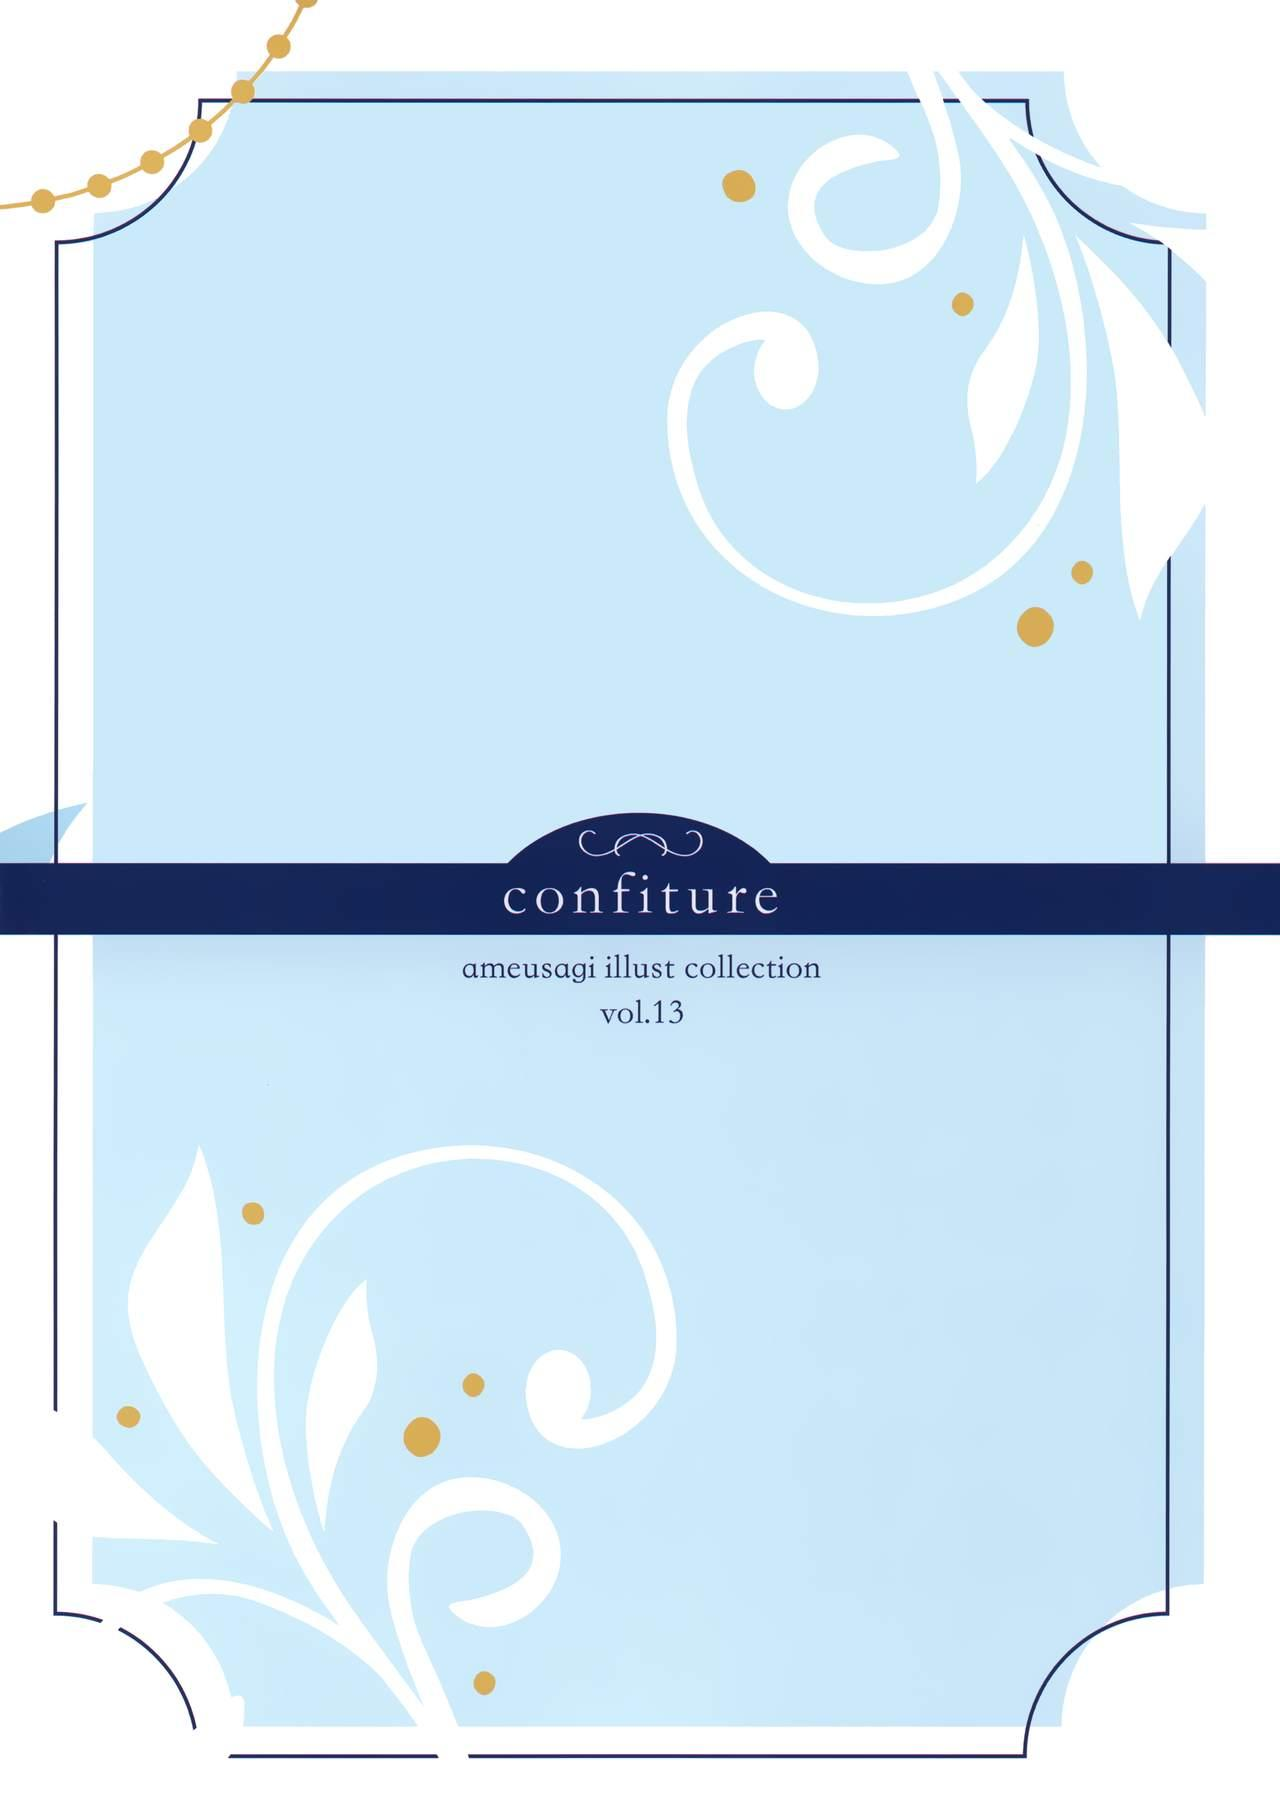 confiture ameusagi illust collection vol.13 12